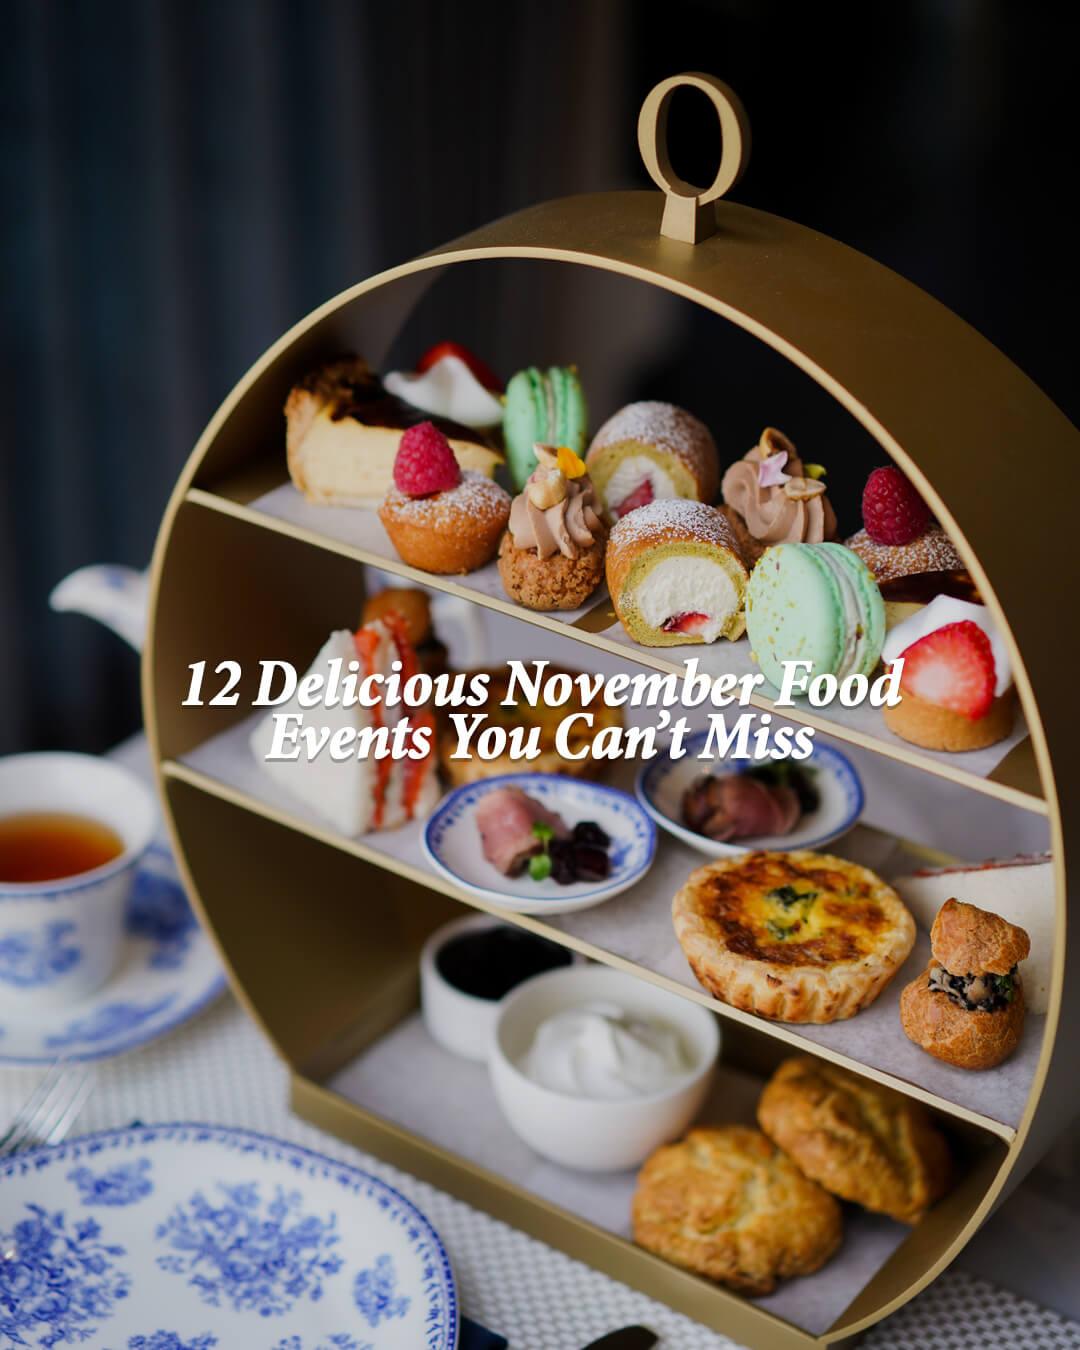 Noms+Nov+Food+Events+S1.jpg